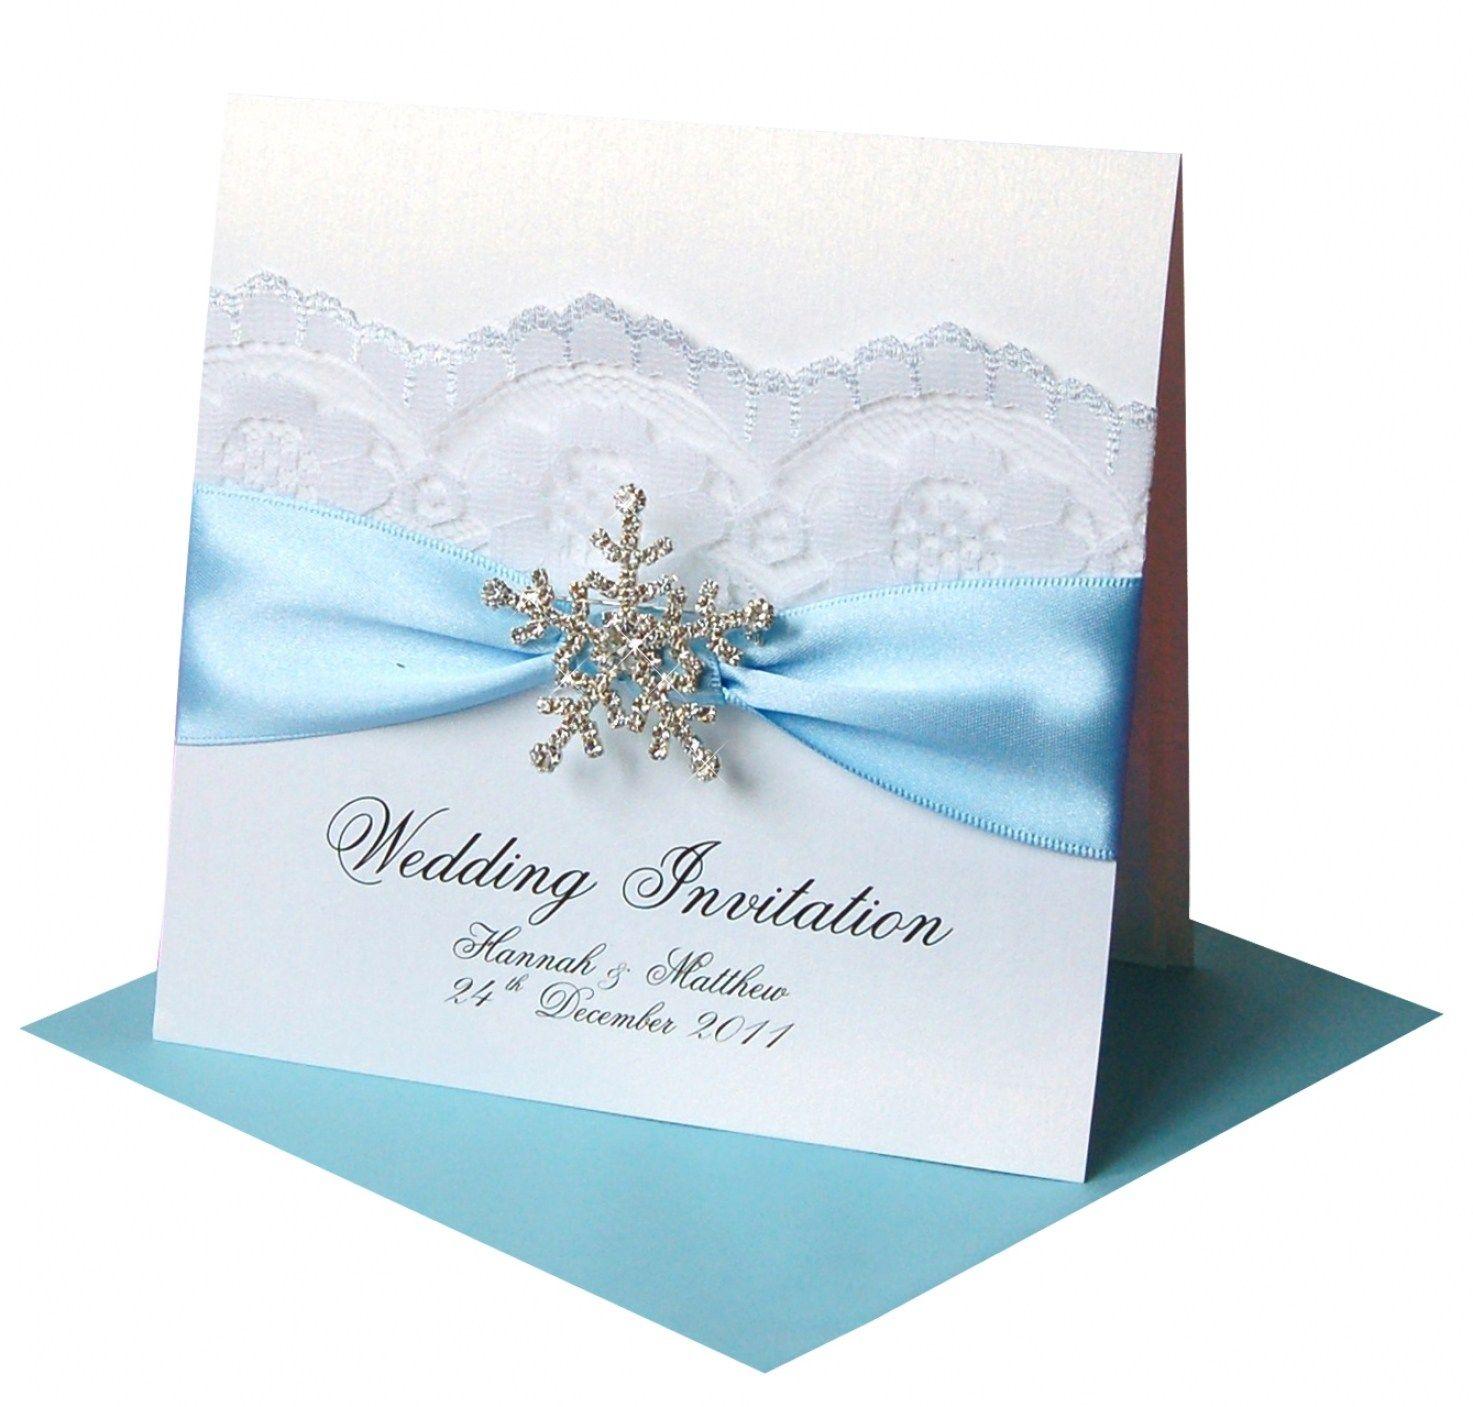 Winter Wonderland Wedding Invitations For